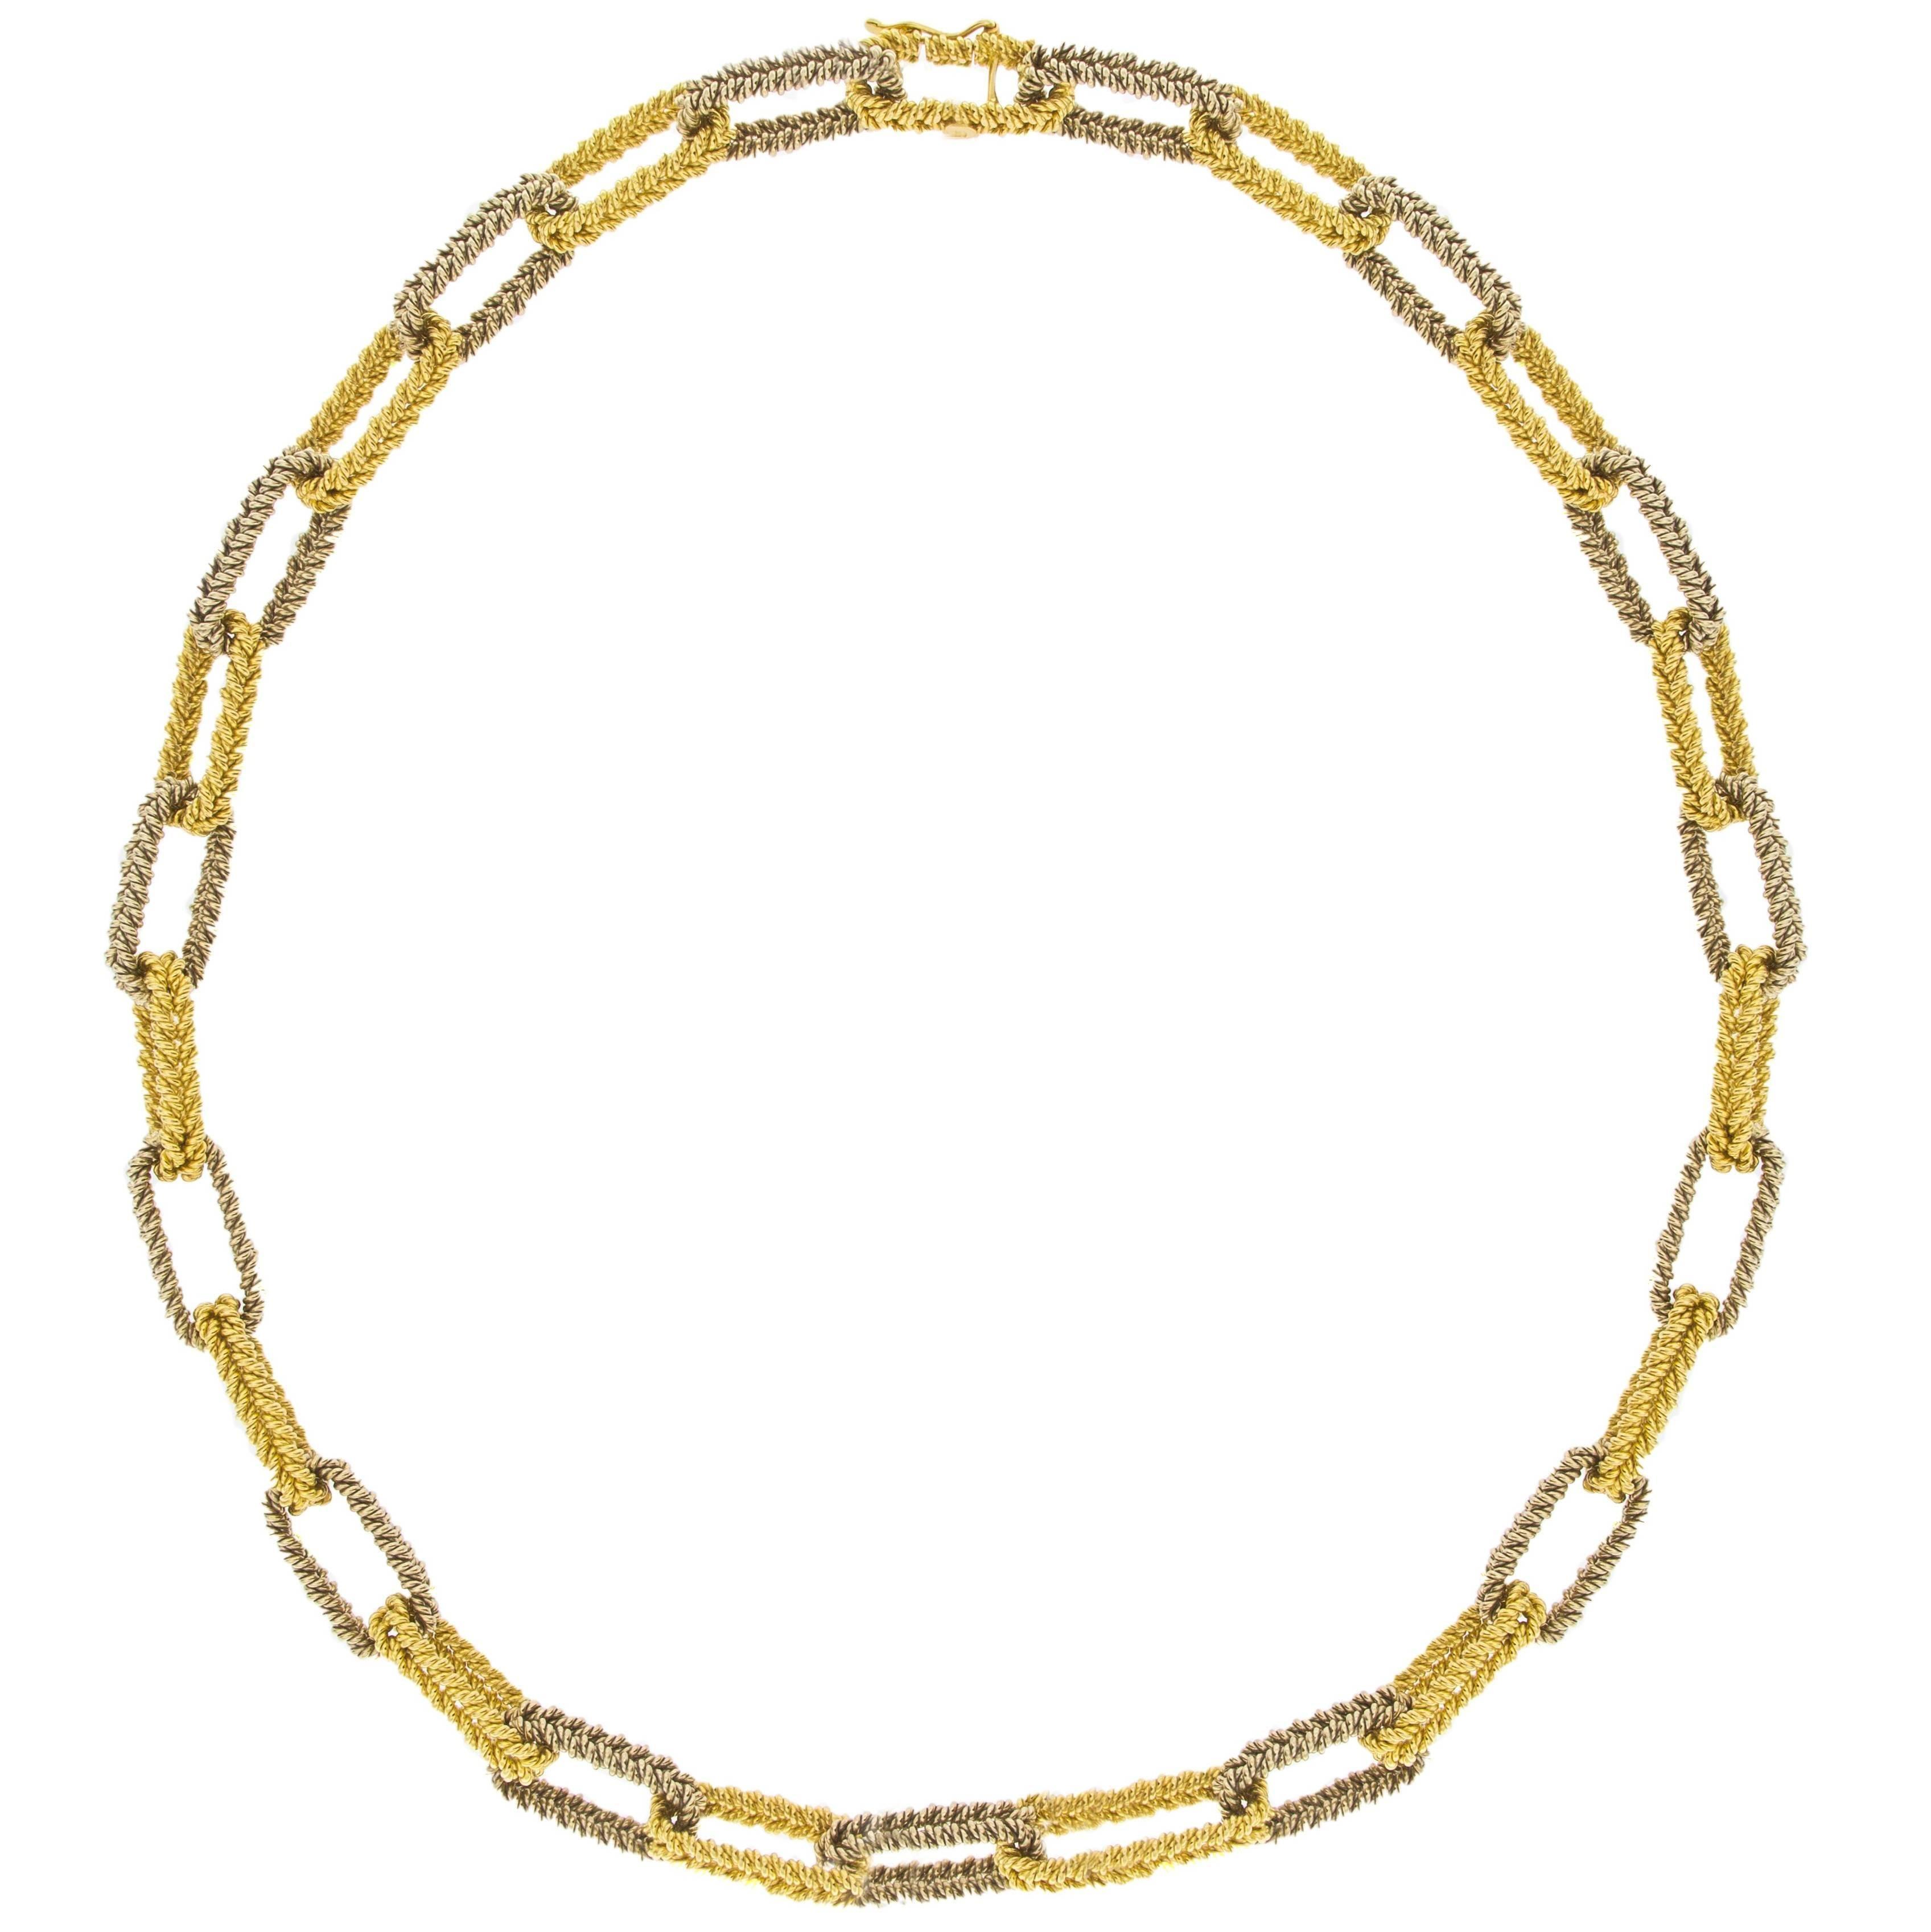 Jona Two Tone Yellow & White 18 Karat Gold Link Chain Necklace